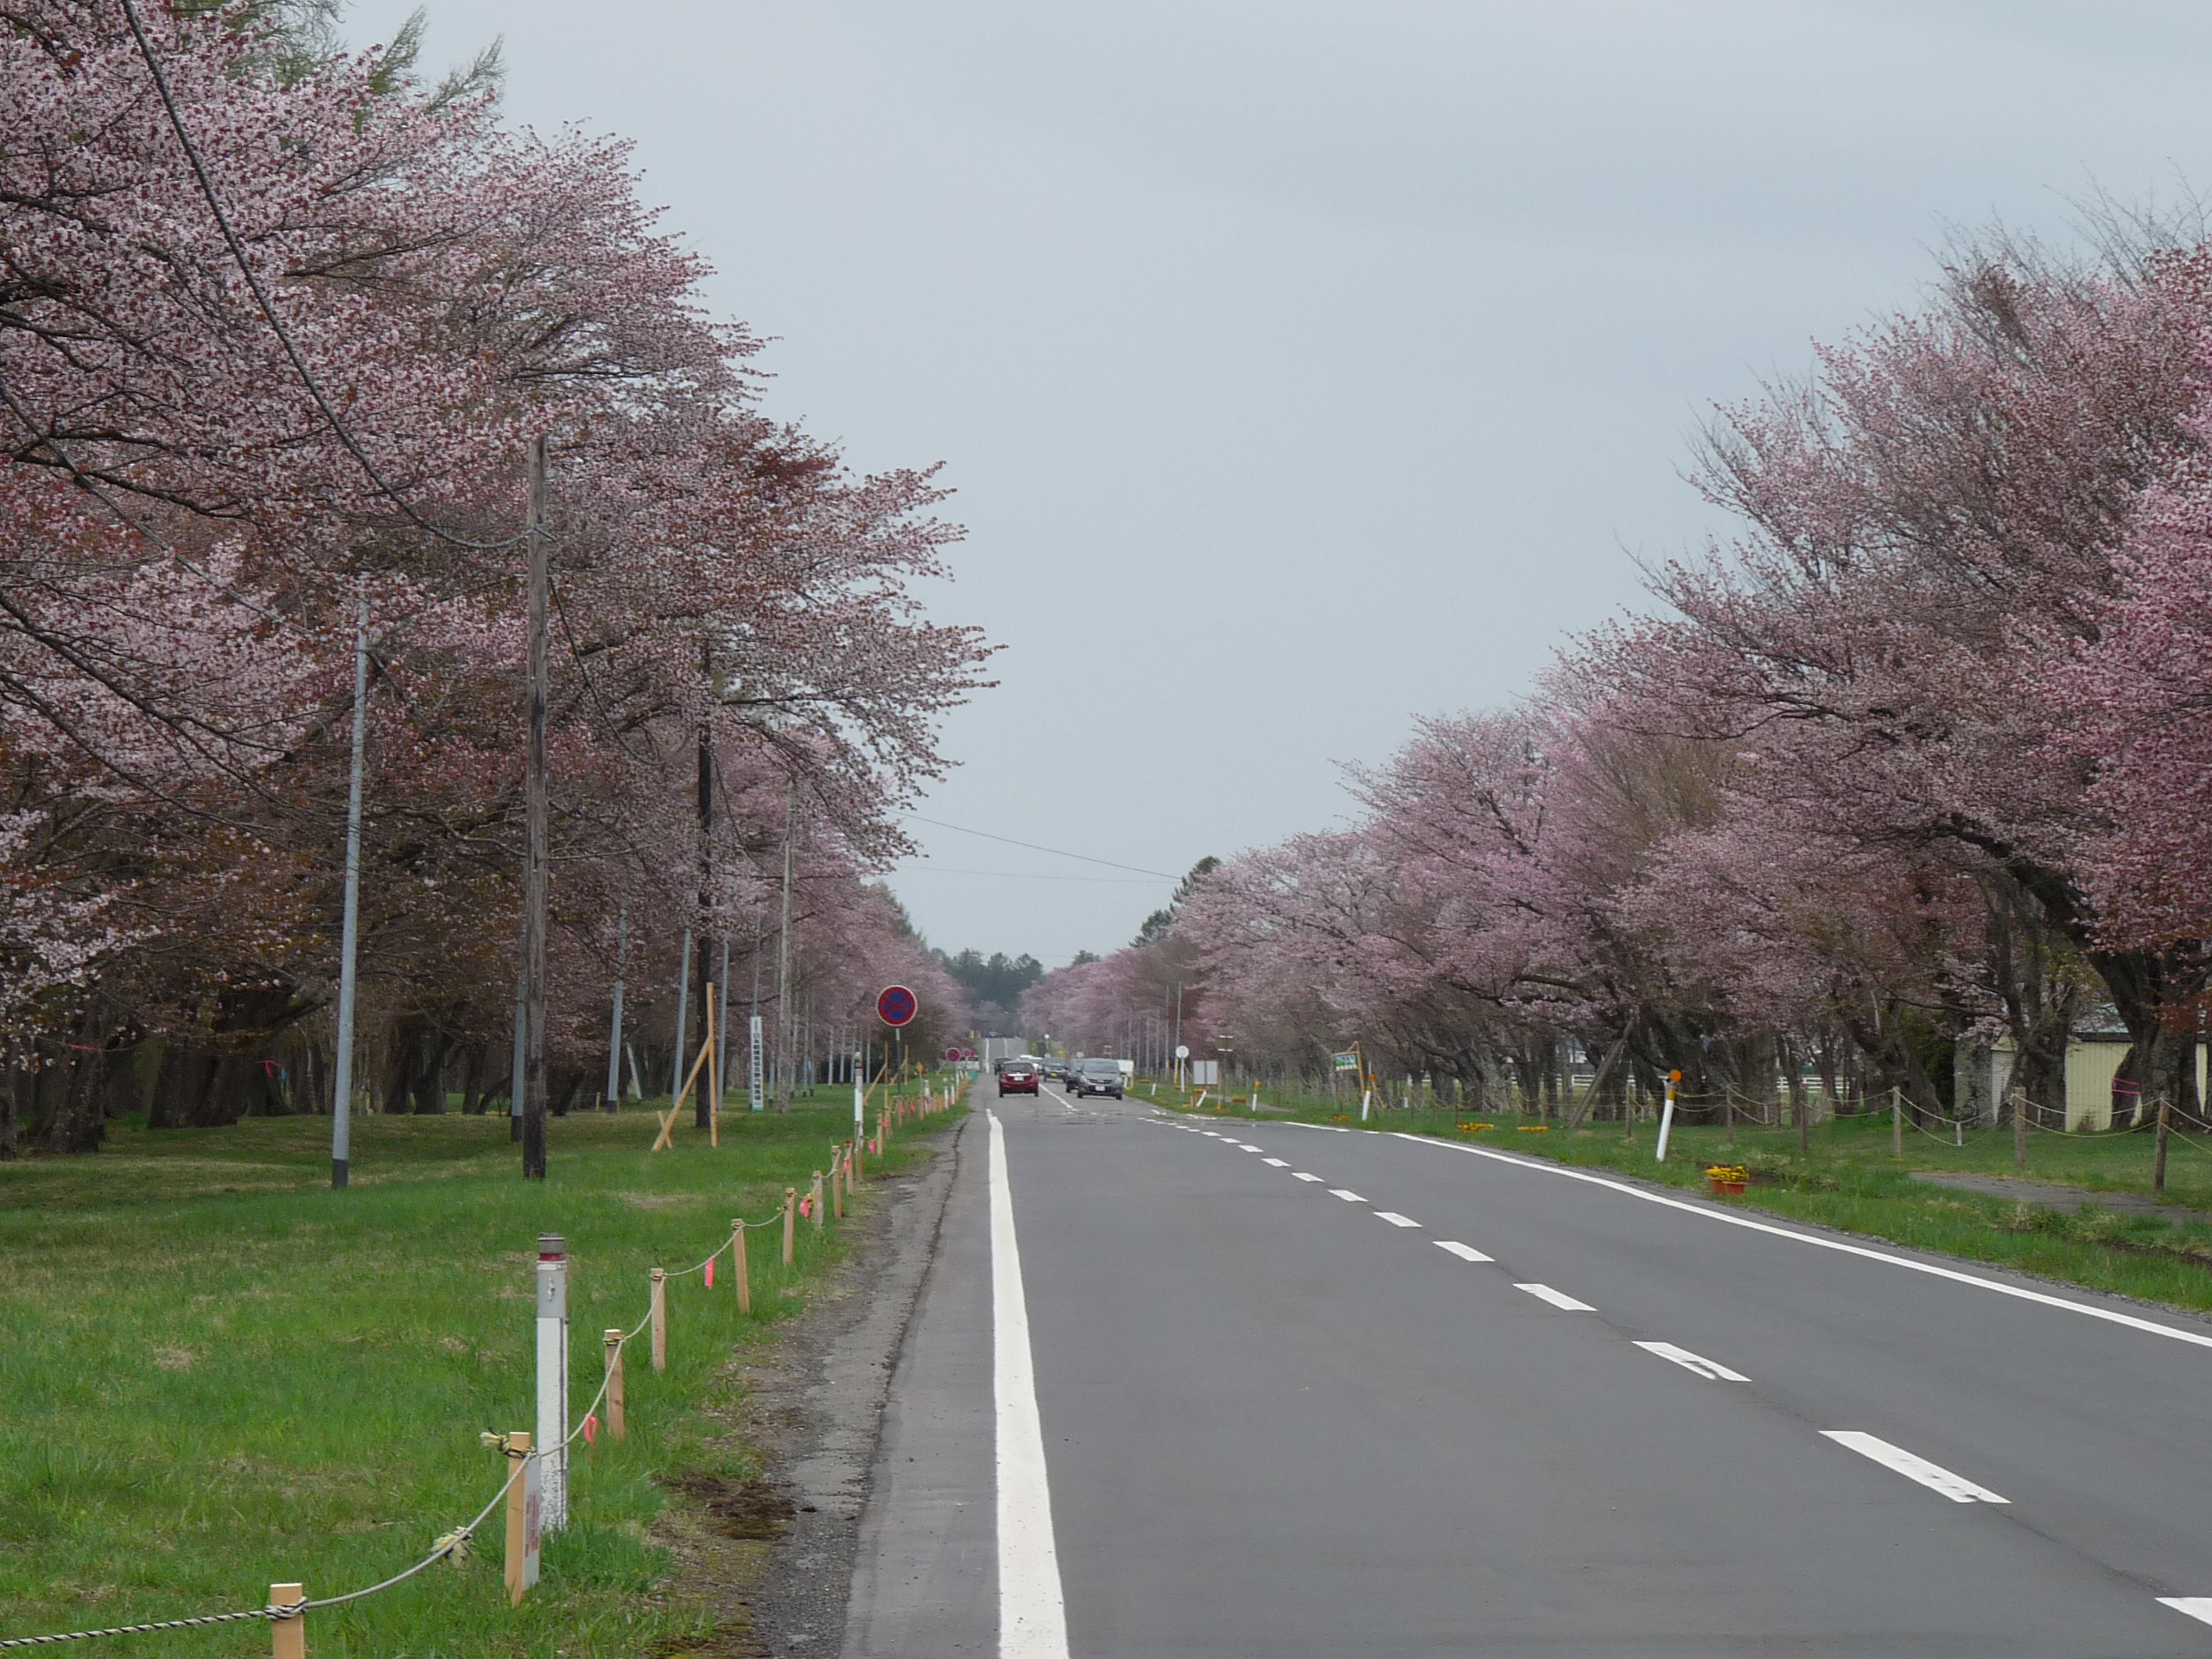 静内二十間道路の桜